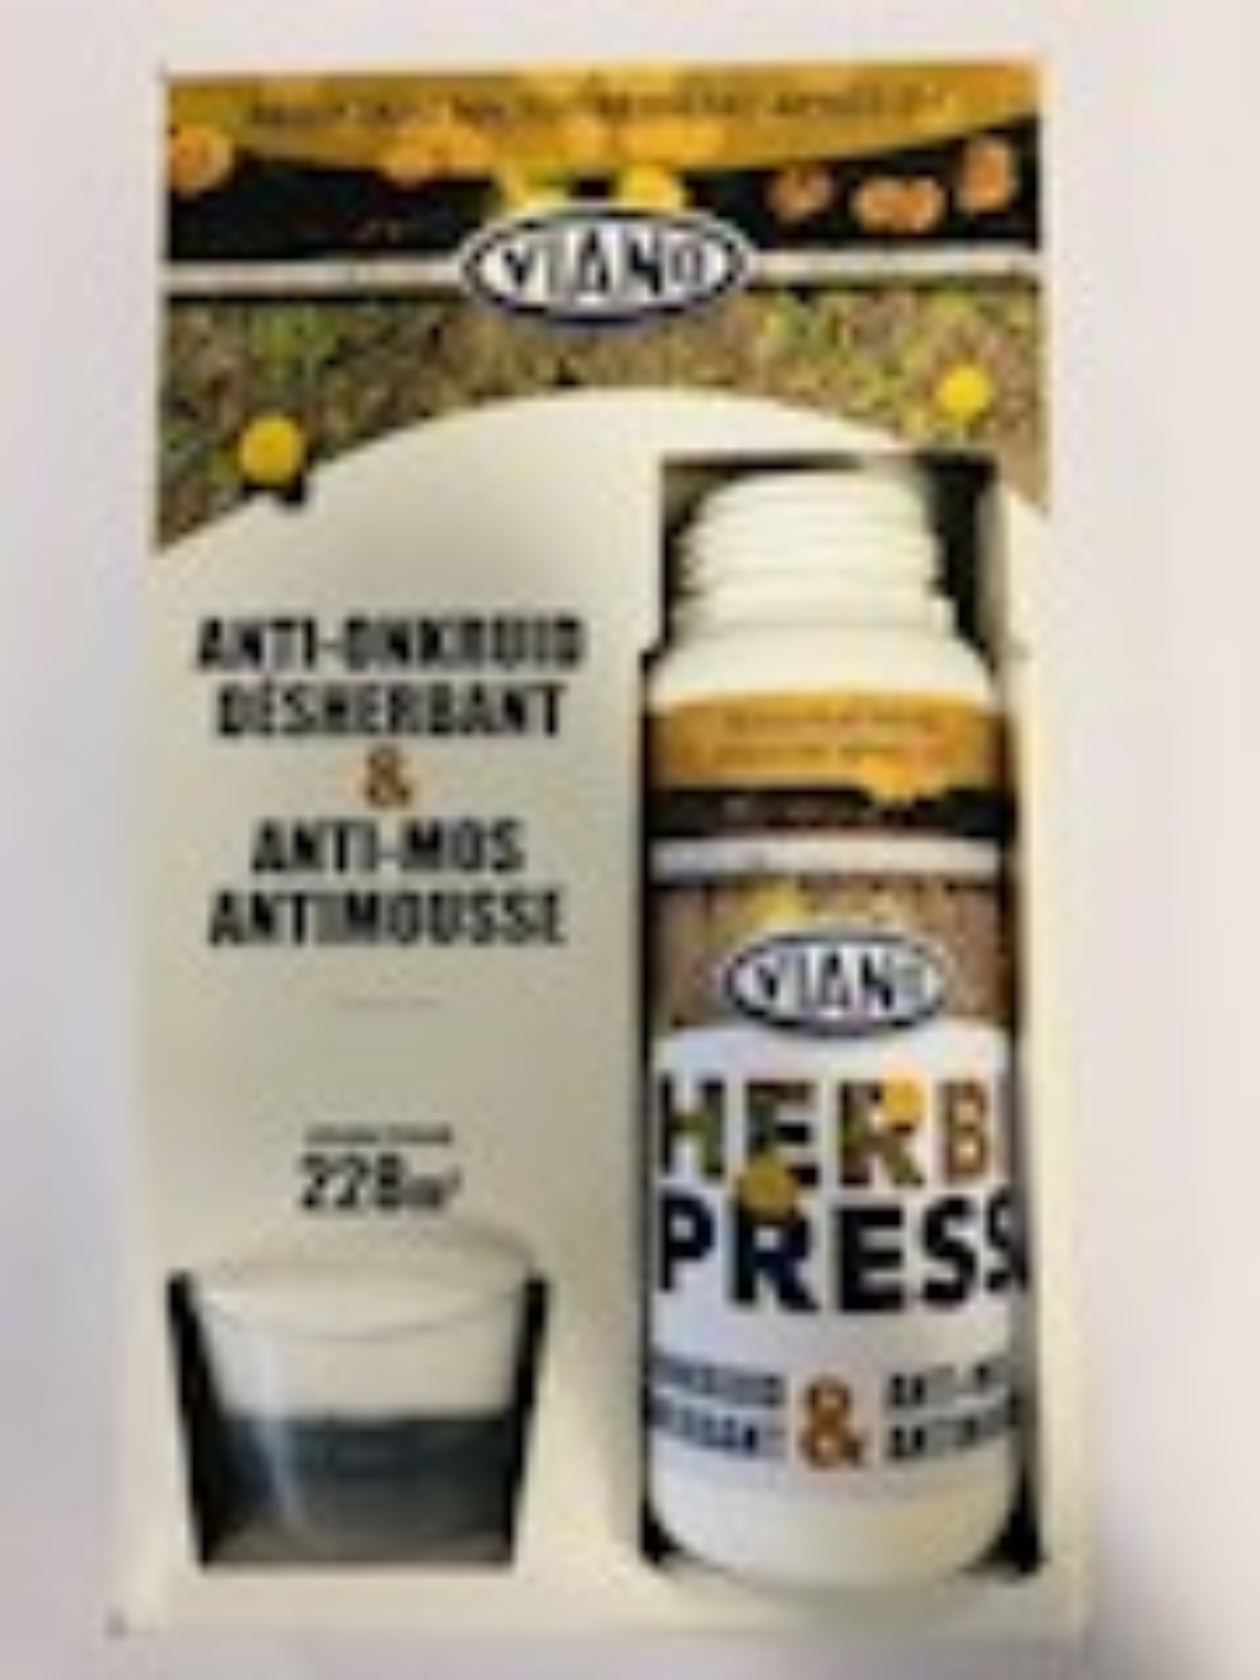 Herbi press 0,5L - tegen onkruid en mos